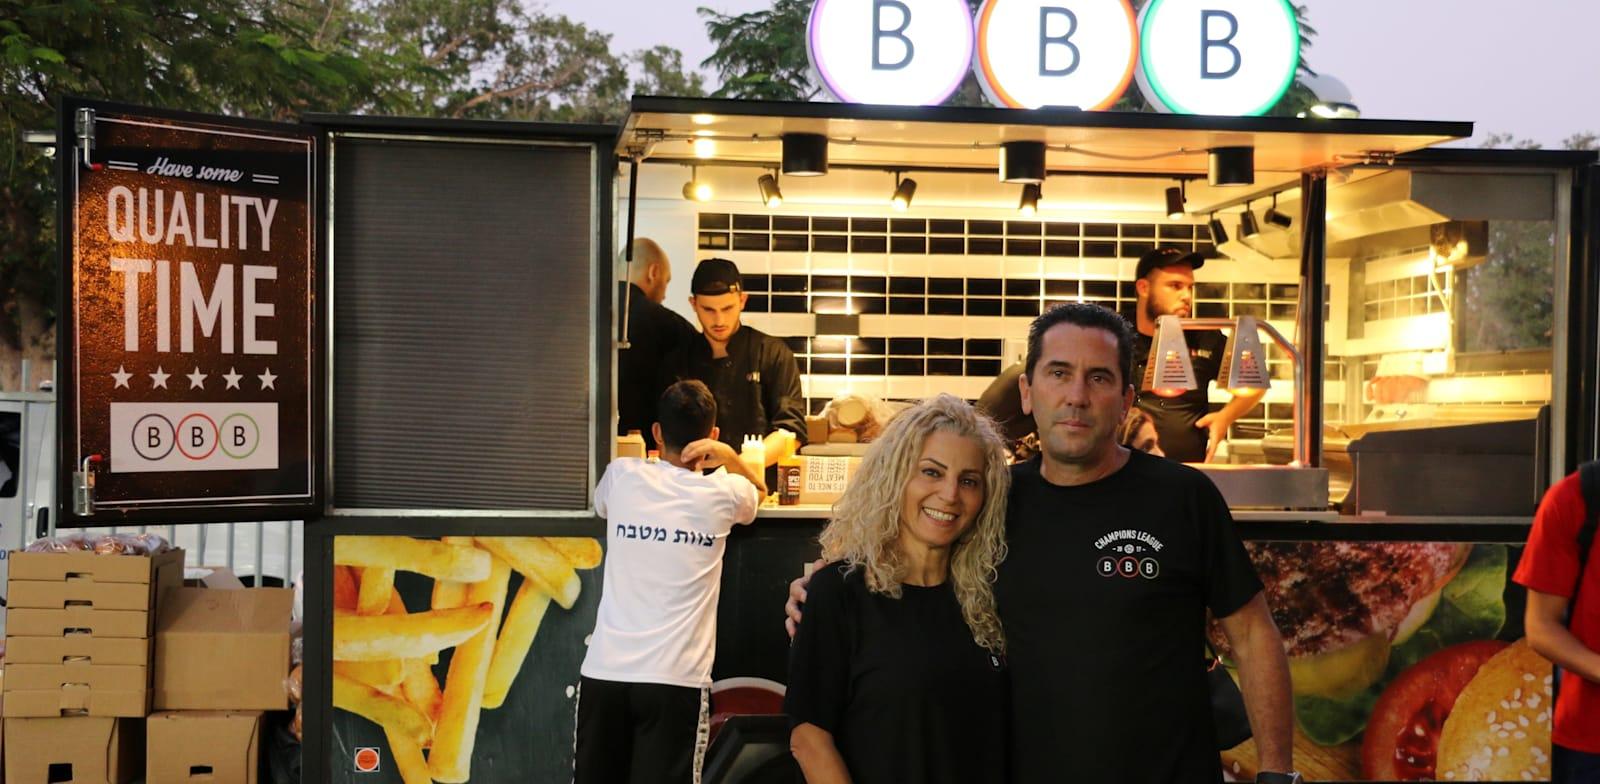 BBB owners Ron Shulman and Ahuva Turjeman